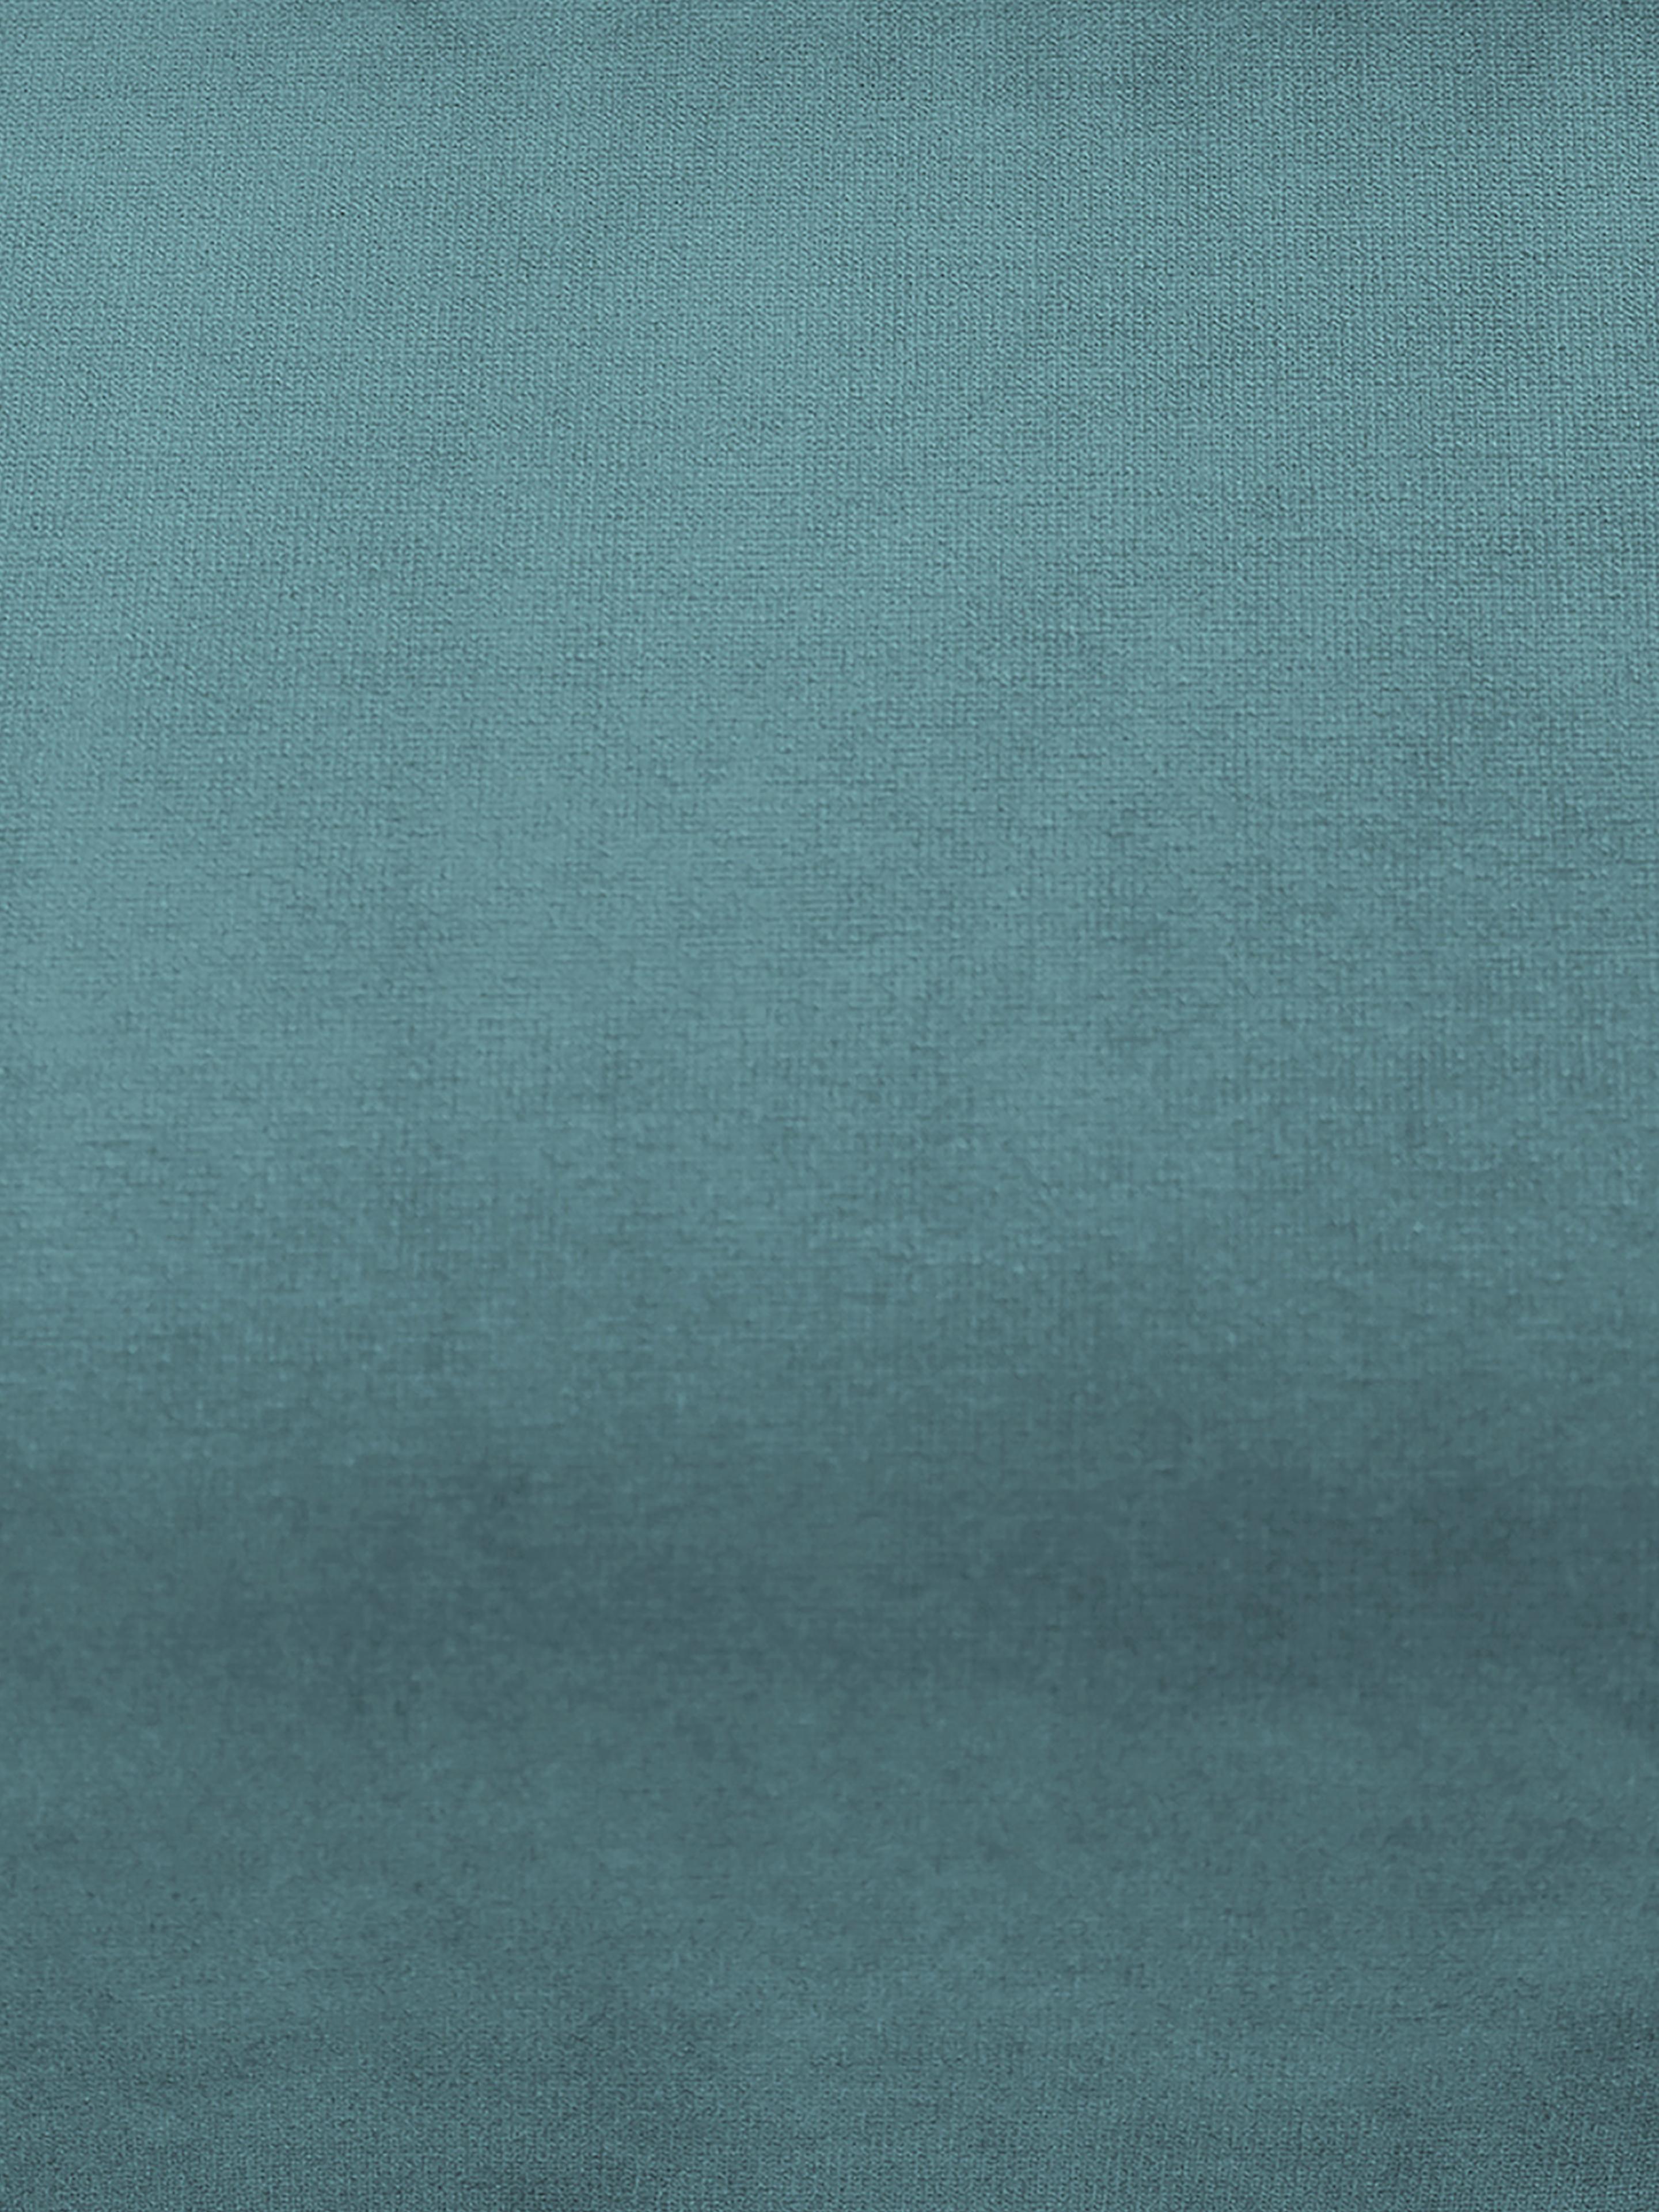 Samt-Ecksofa Moby, Bezug: Samt (Hochwertiger Polyes, Gestell: Massives Kiefernholz, Füße: Metall, pulverbeschichtet, Samt Türkis, B 280 x T 160 cm